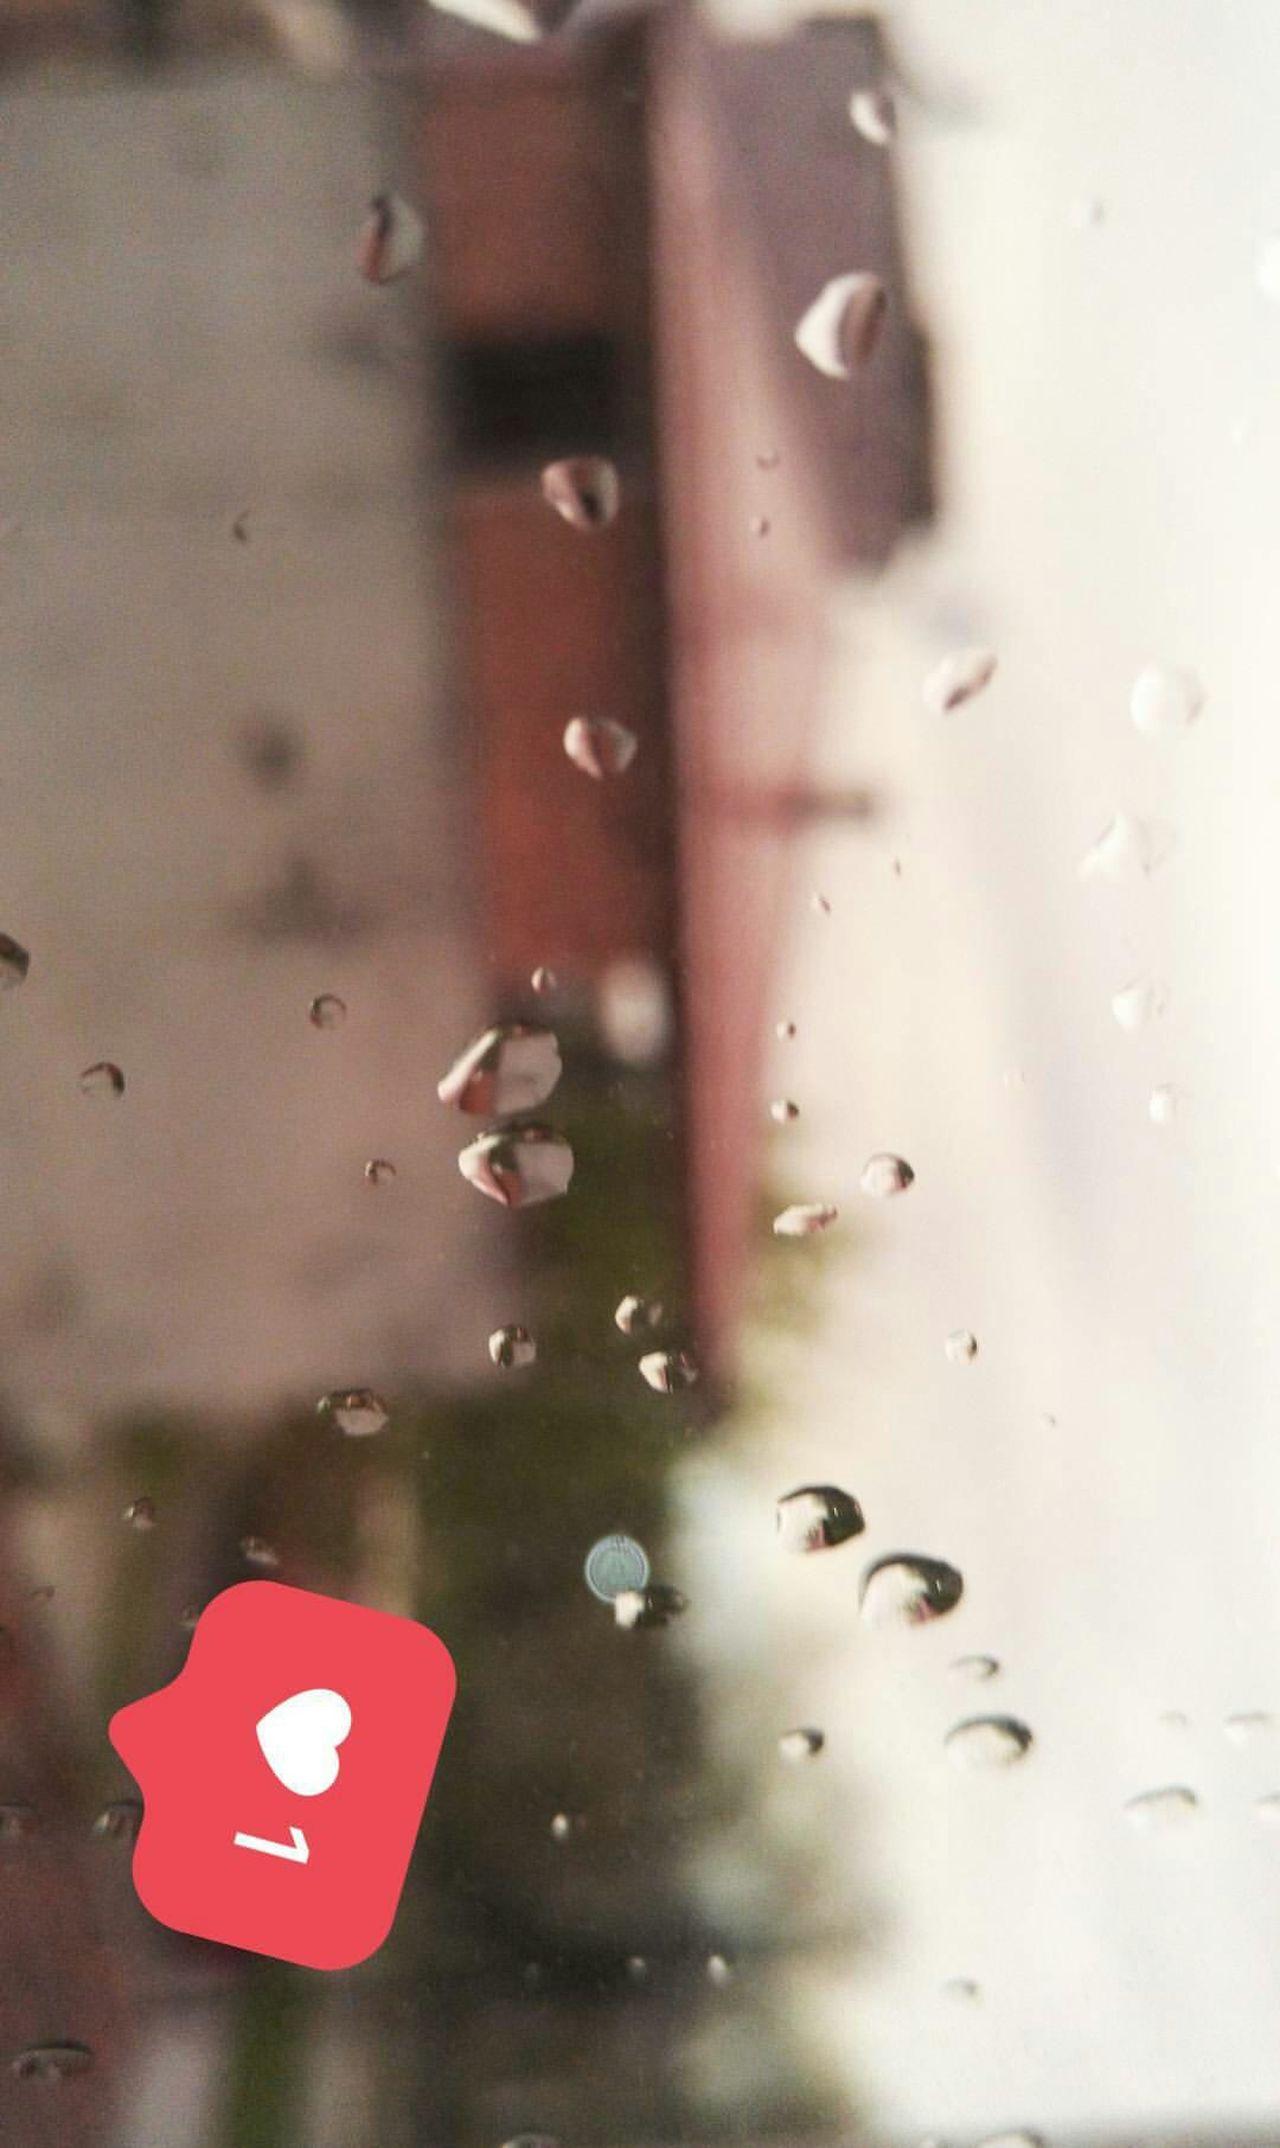 EyeEmNewHere Reflection Red Focus On Foreground No People Close-up Day Outdoors Water Yağmur April NİSAN Pencere Window House Ev çatı  Damla Nature City EyeEm Best Shots Samsun Sky